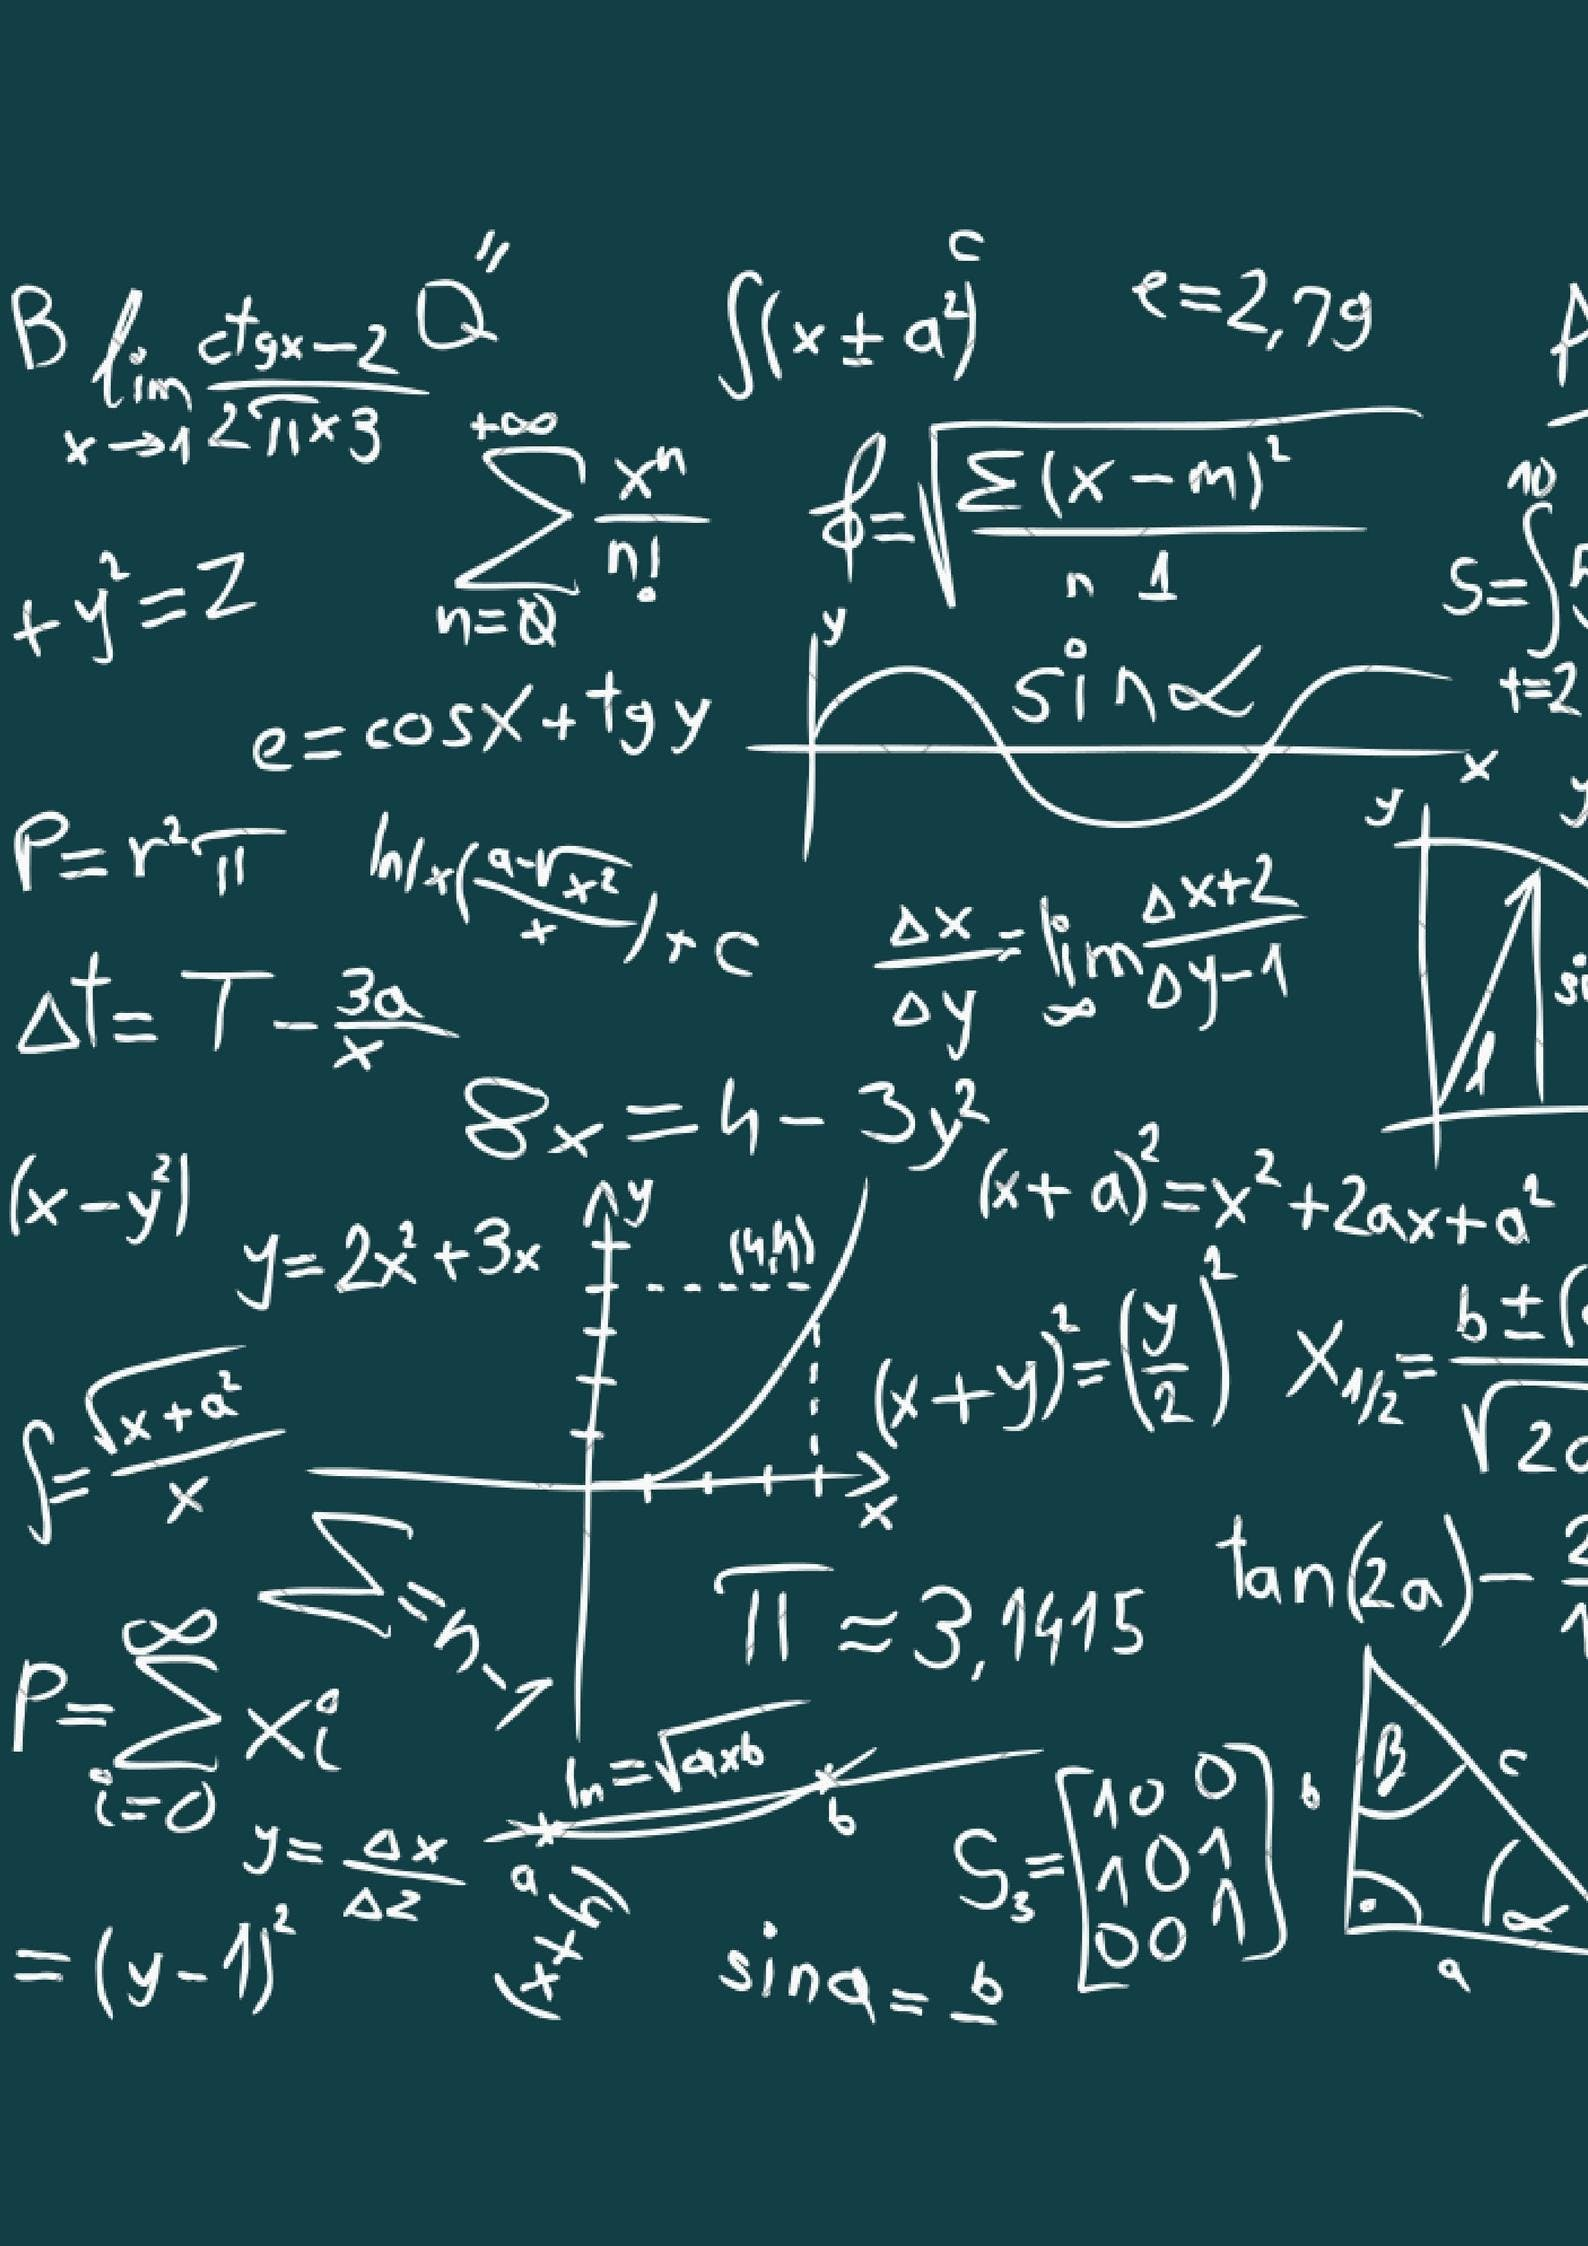 Mastering Mathematics - The Elliot Foundation Annual Mathematics Conference